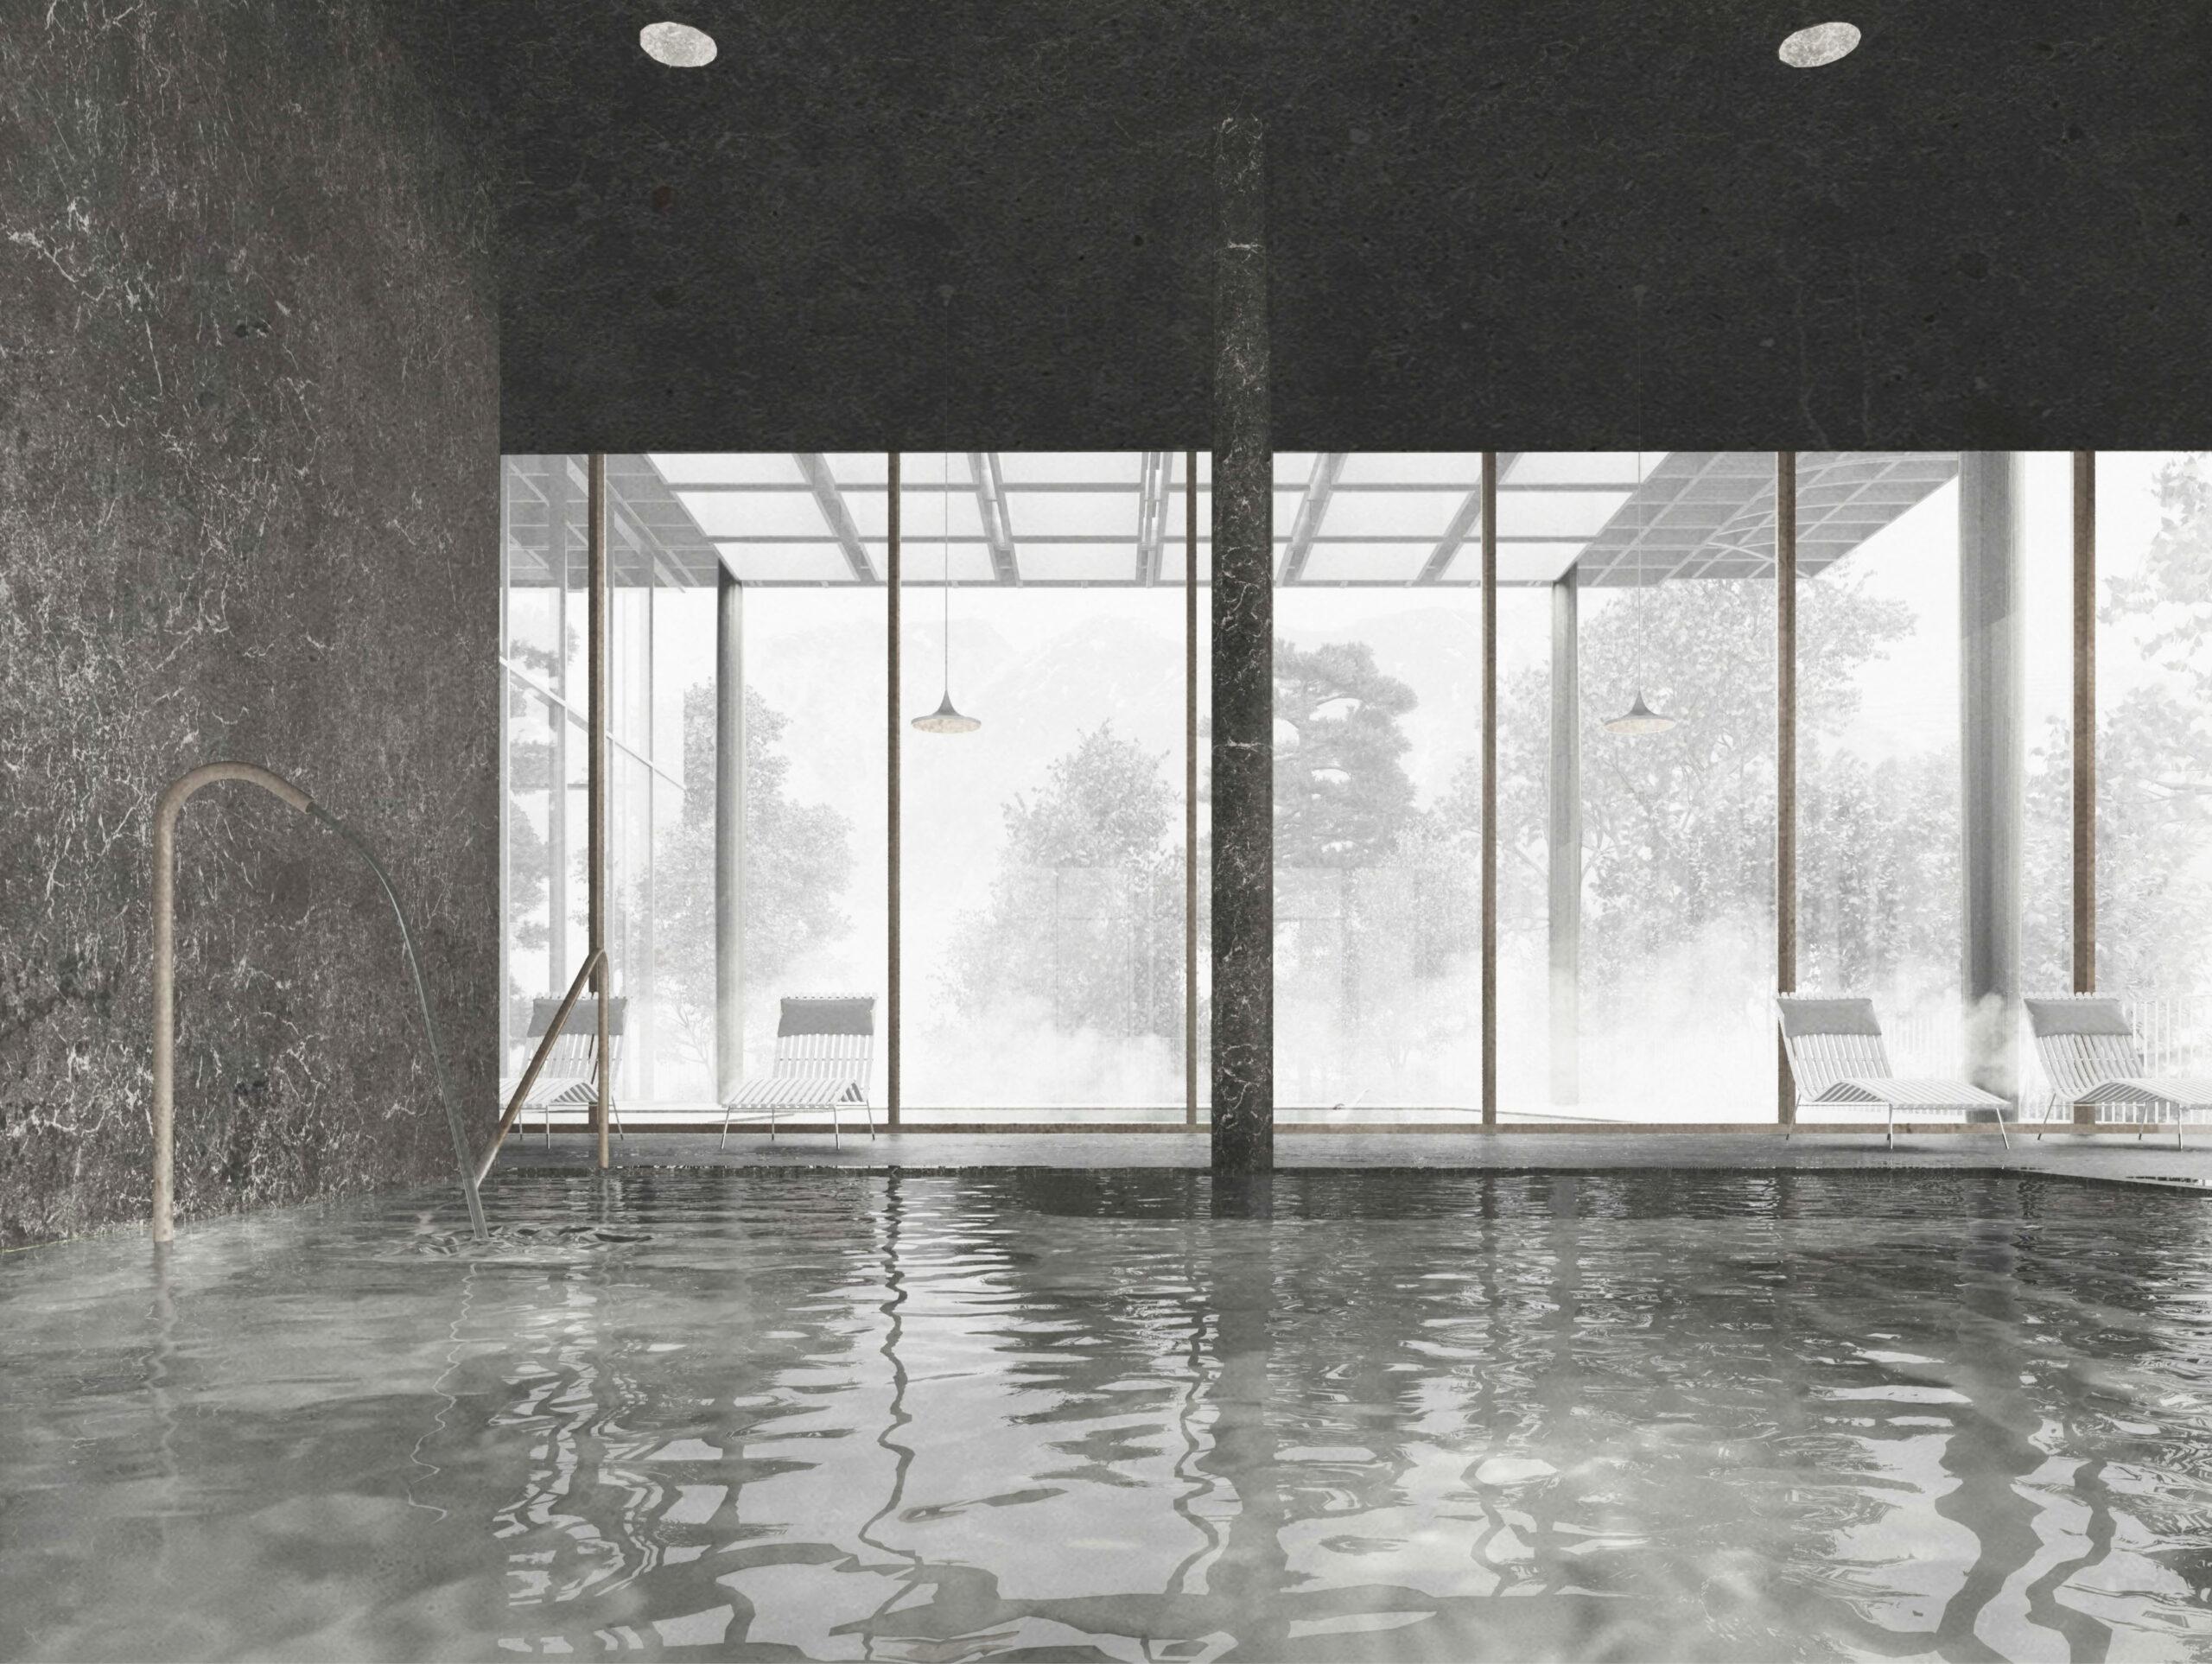 Michael-Becker-Architects-Architekten-Therme-Oberstdorf-V-Becken